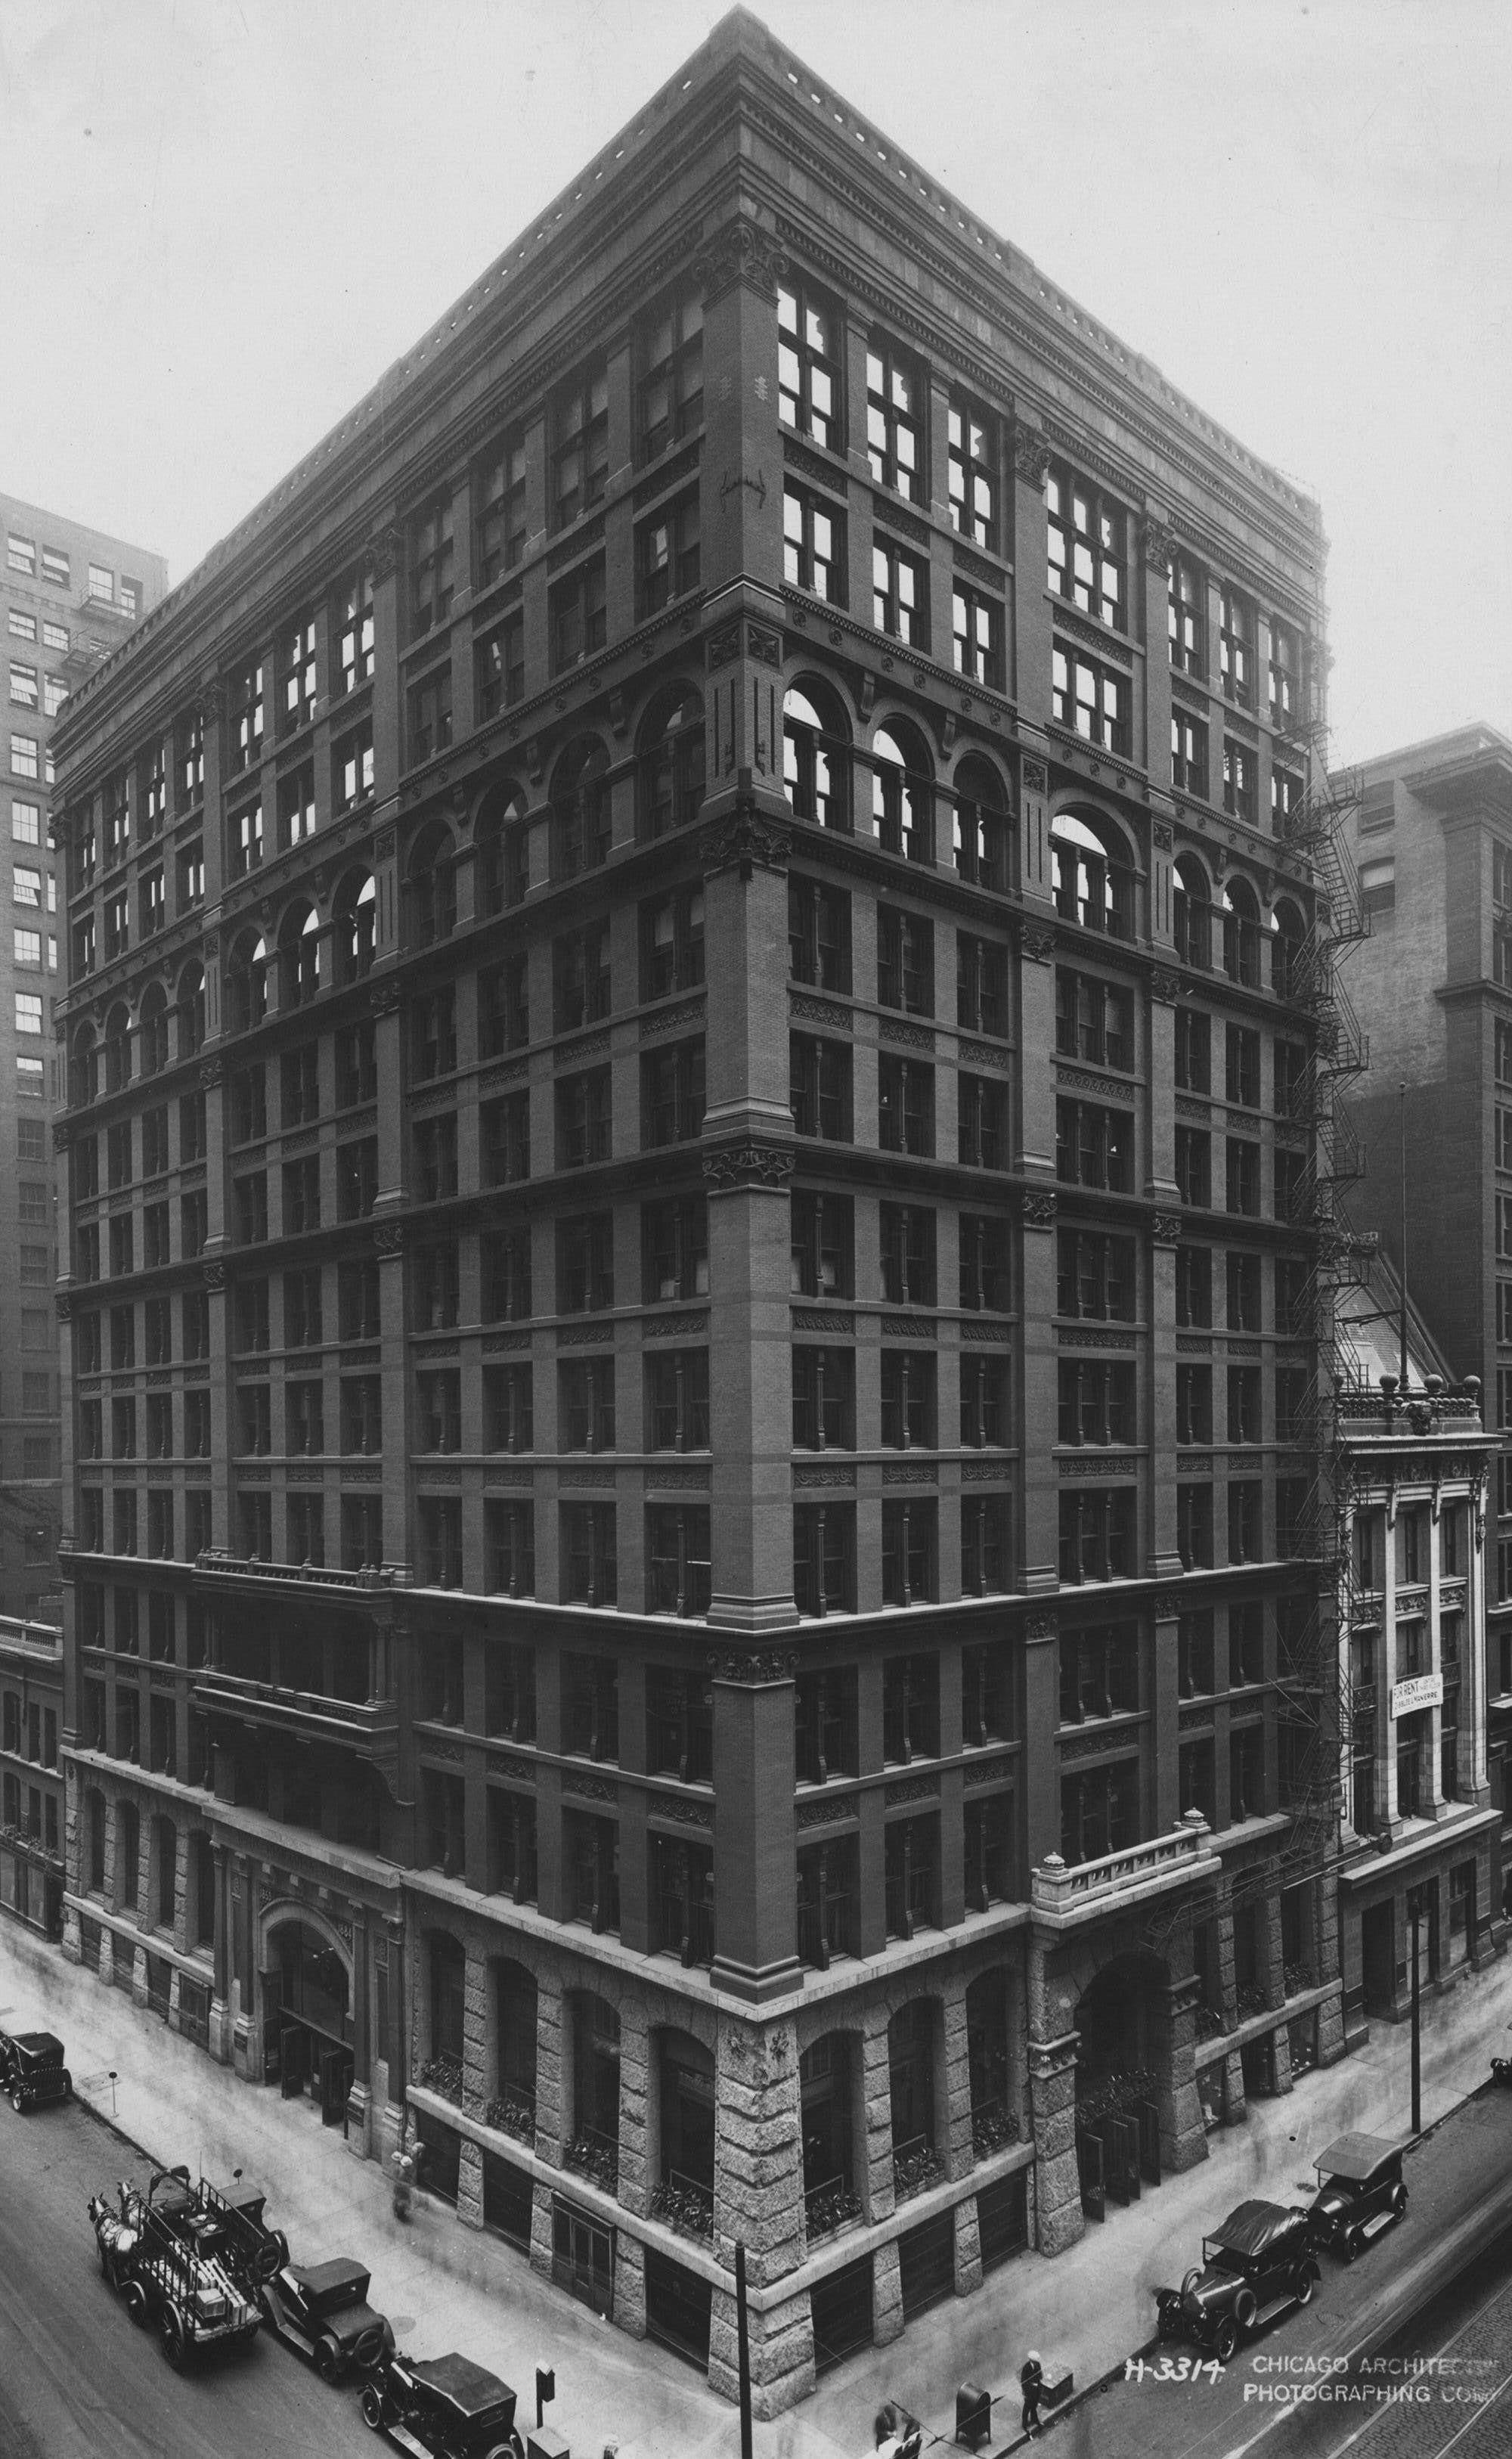 home insurance building william le baron jenney 1885